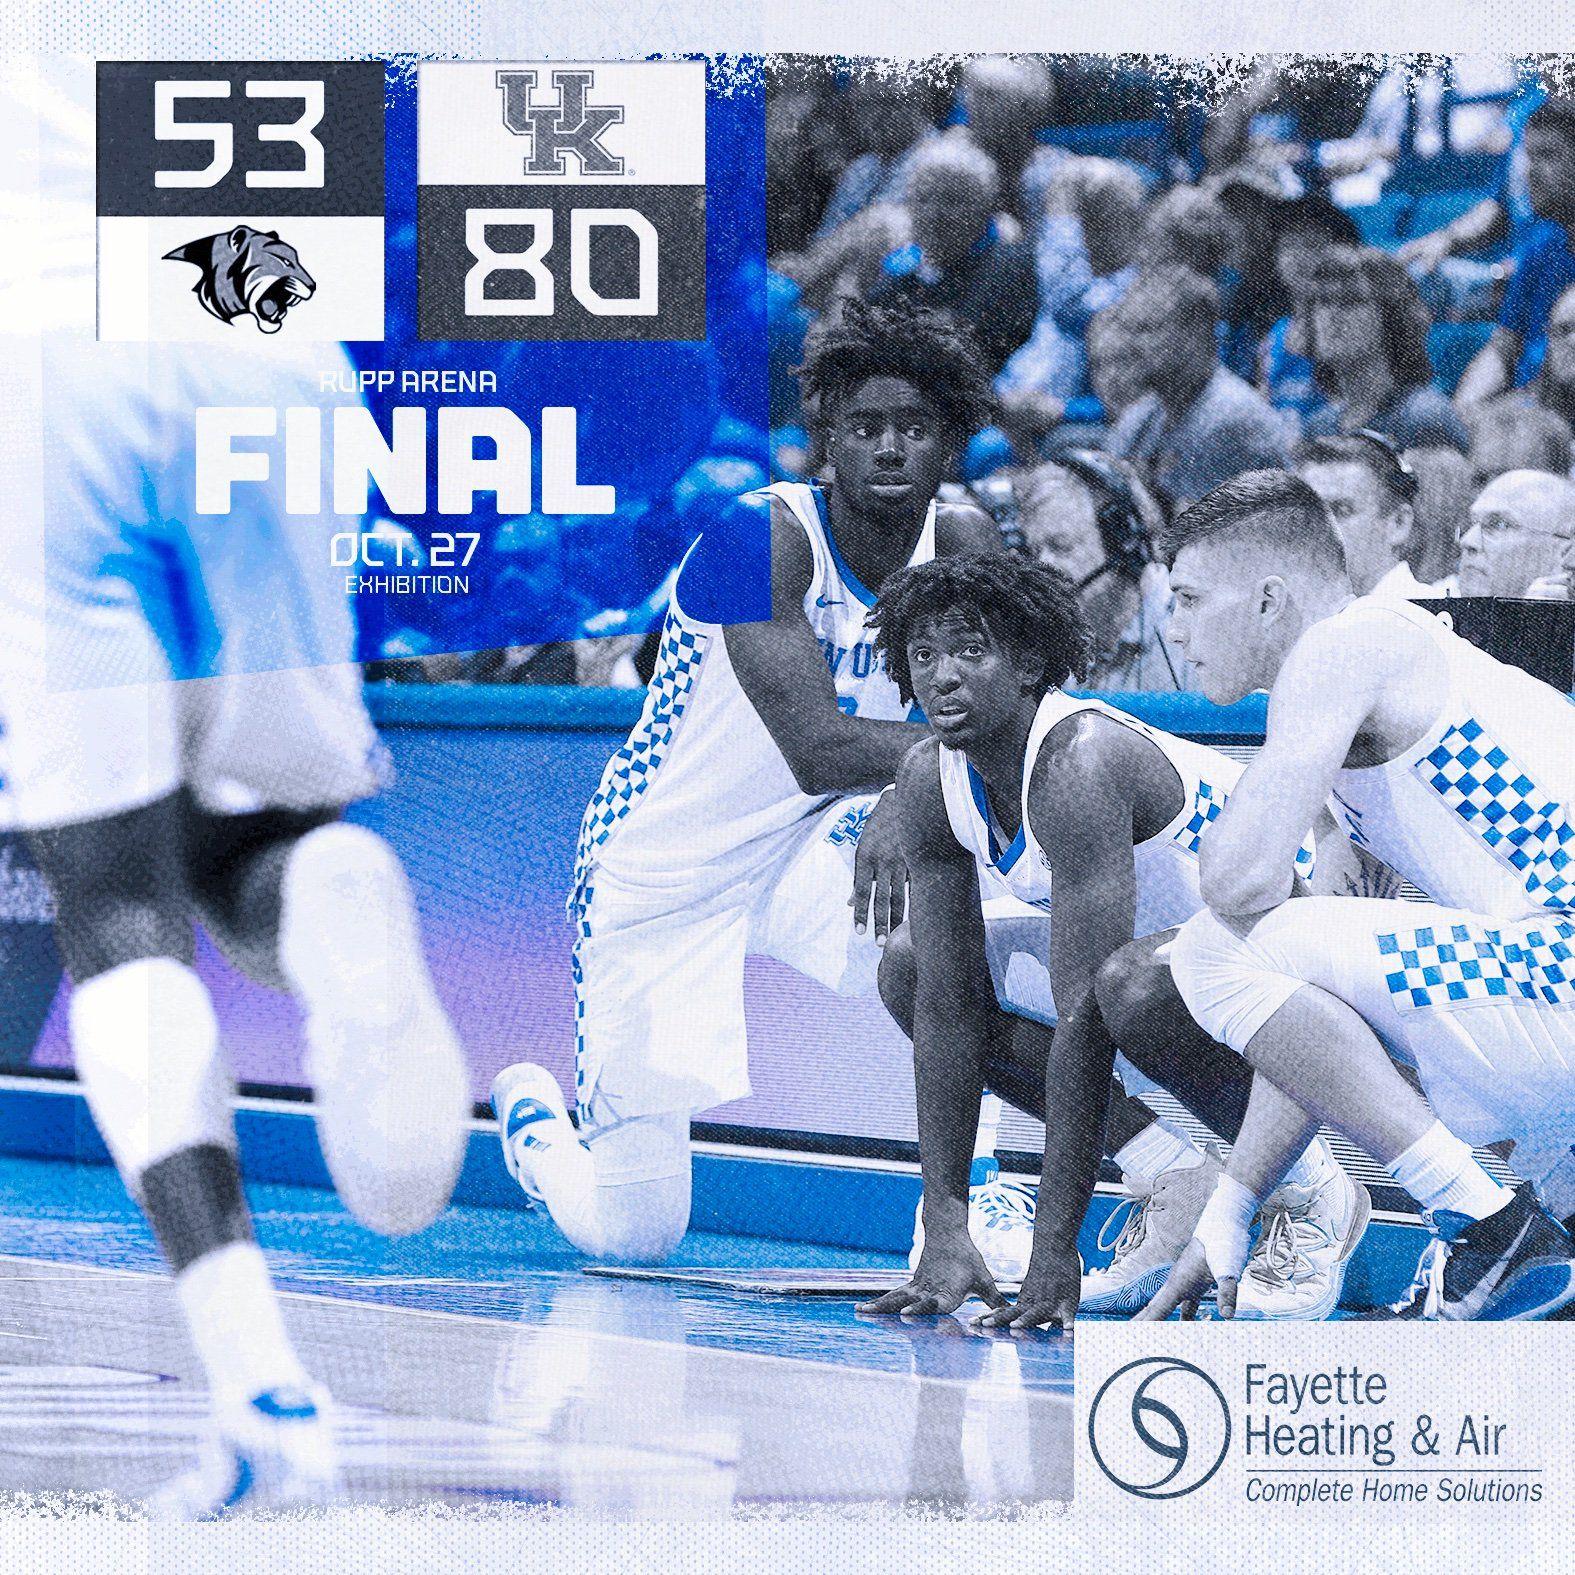 Kentucky Basketball on Kentucky basketball, Kentucky, Go